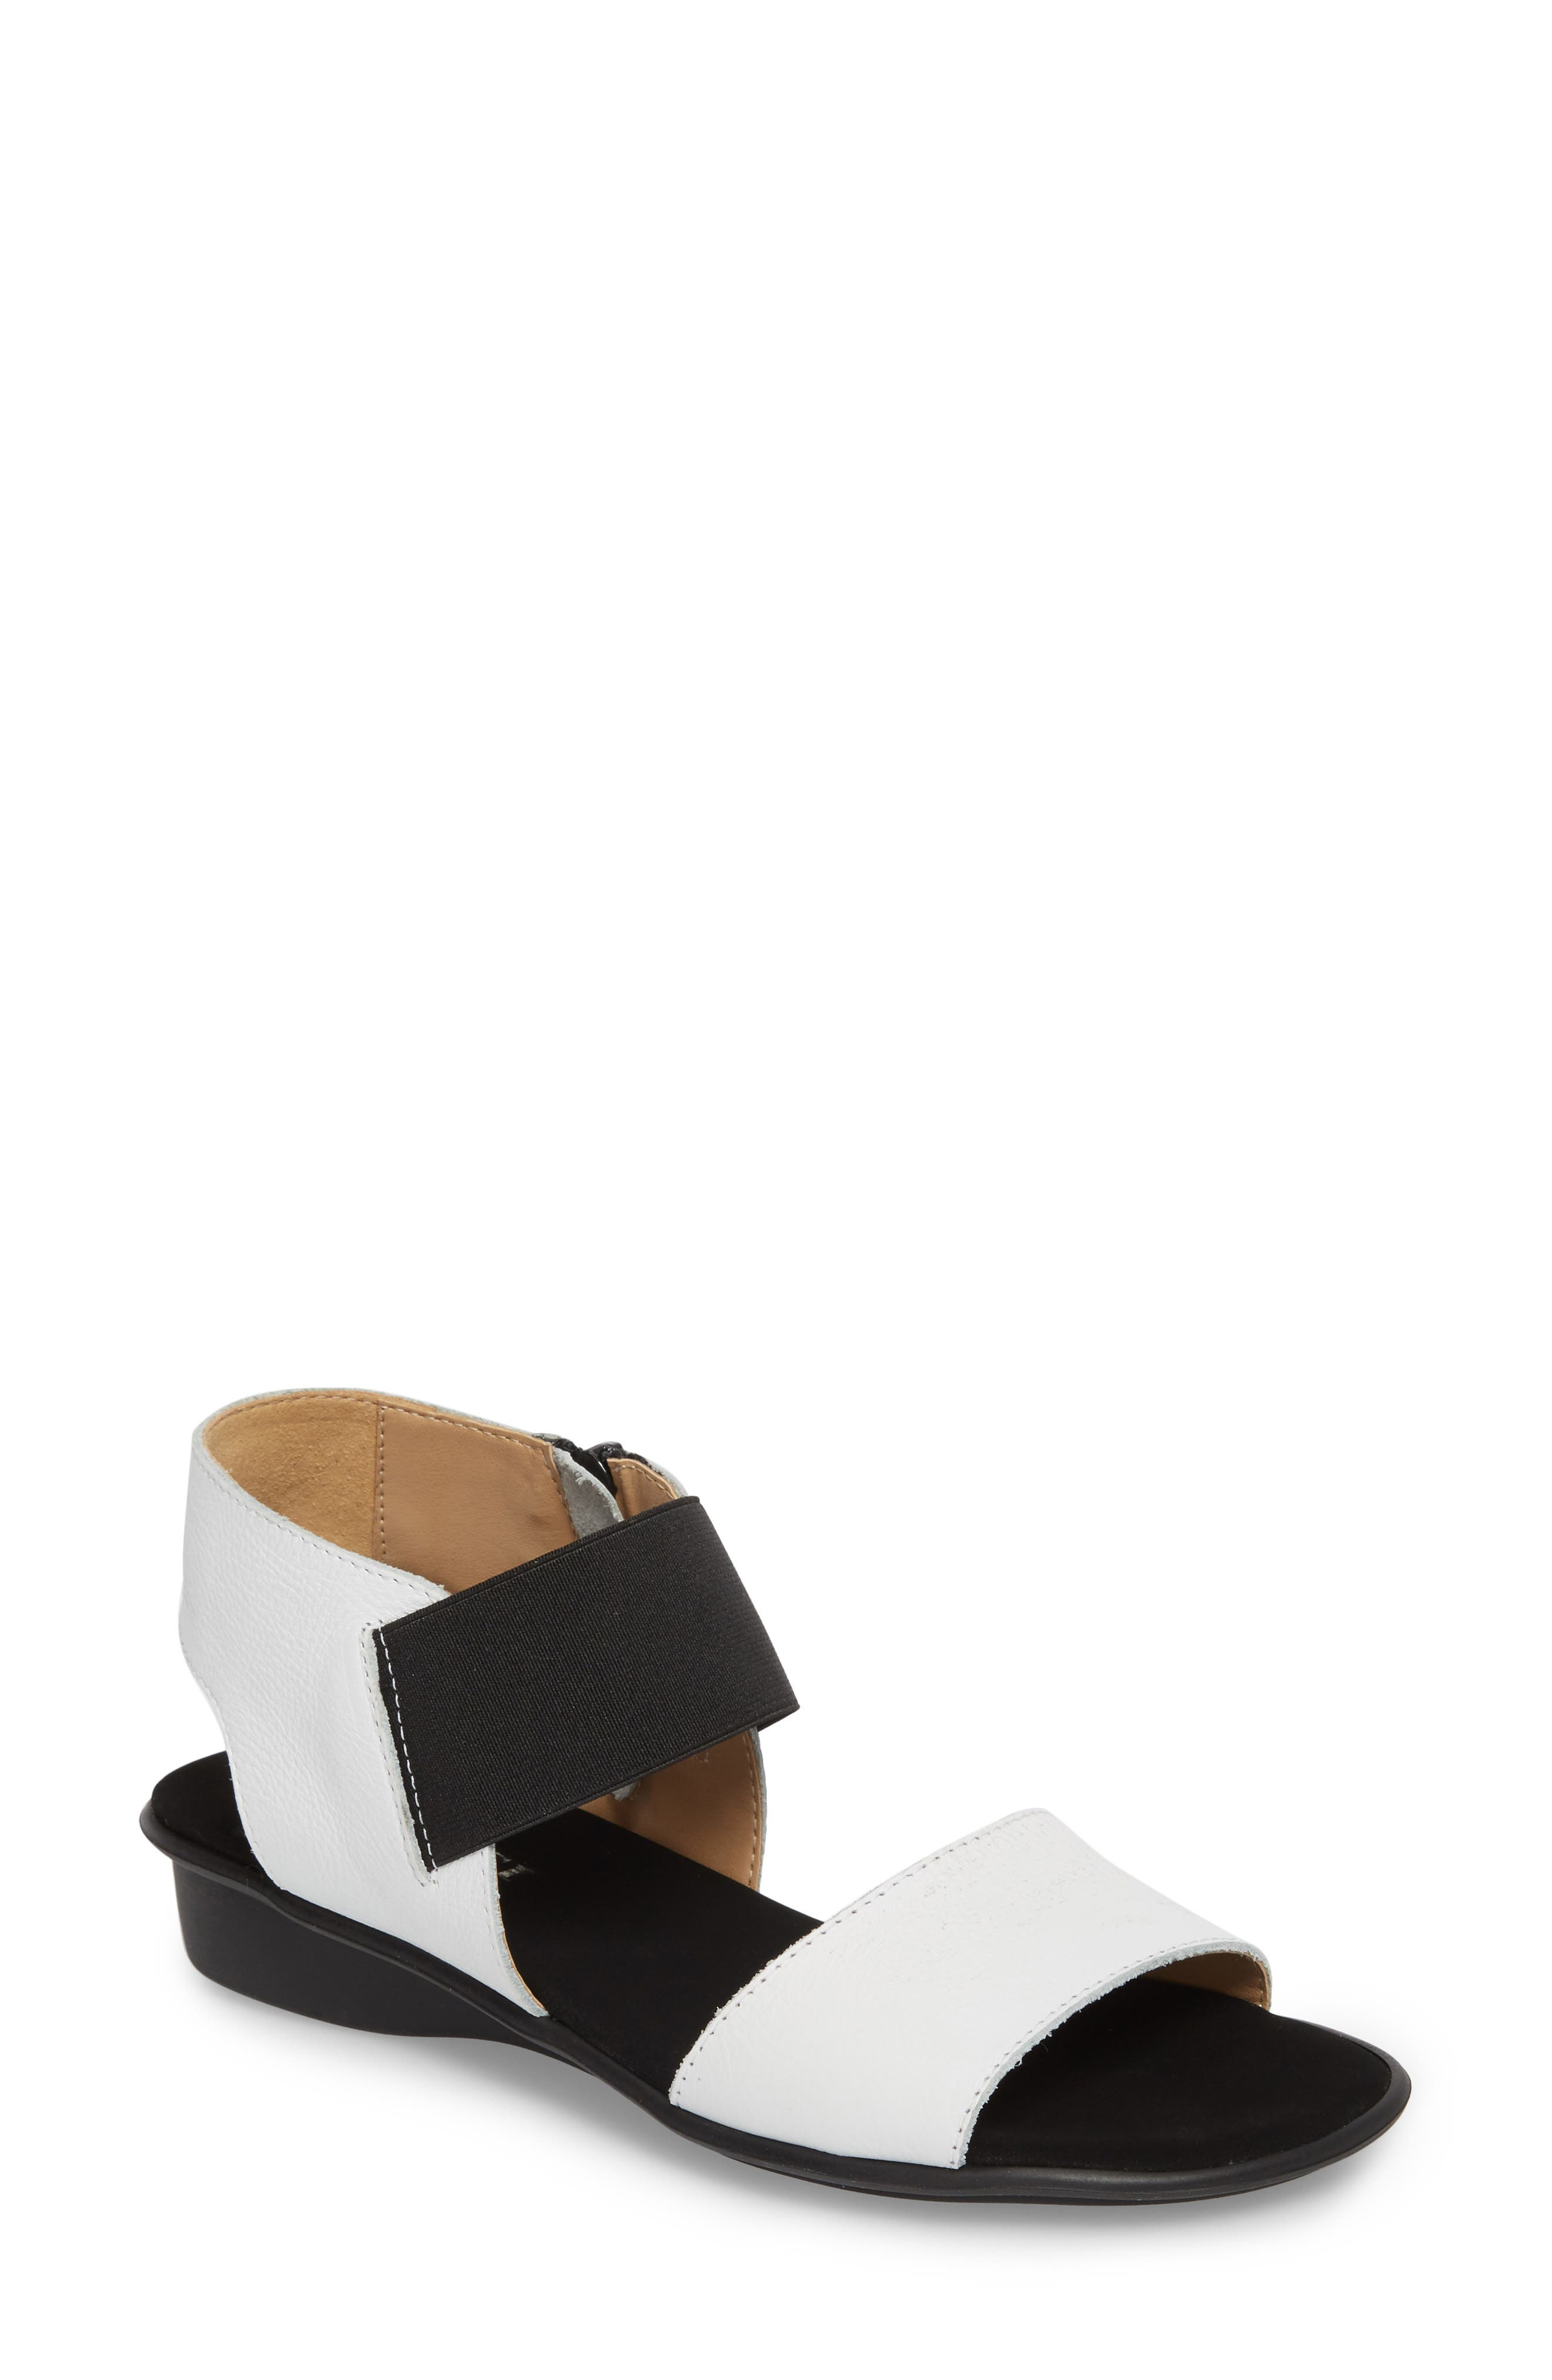 Alternate Image 1 Selected - Sesto Meucci Eirlys Sandal (Women)